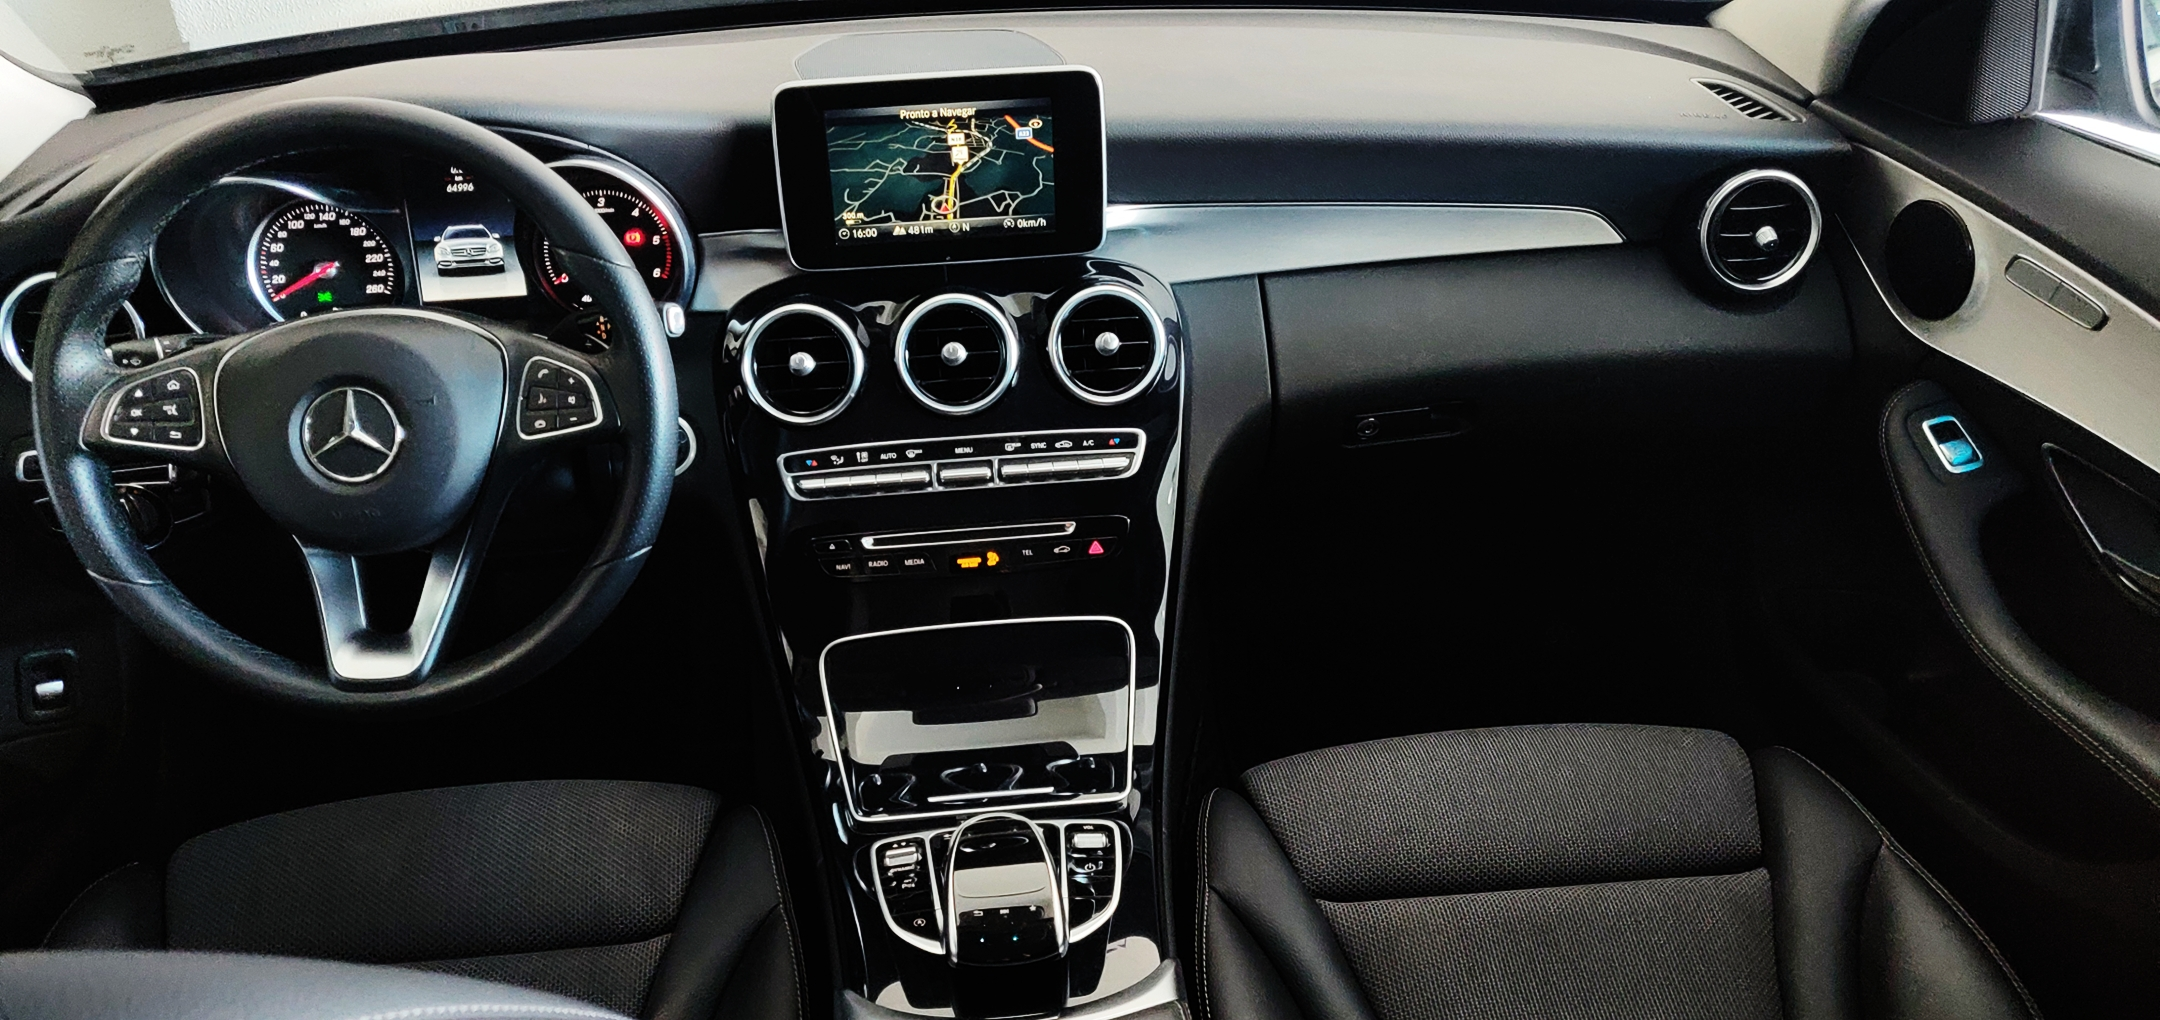 Mercedes-Benz C 220 Avantgarde | Imagem 9